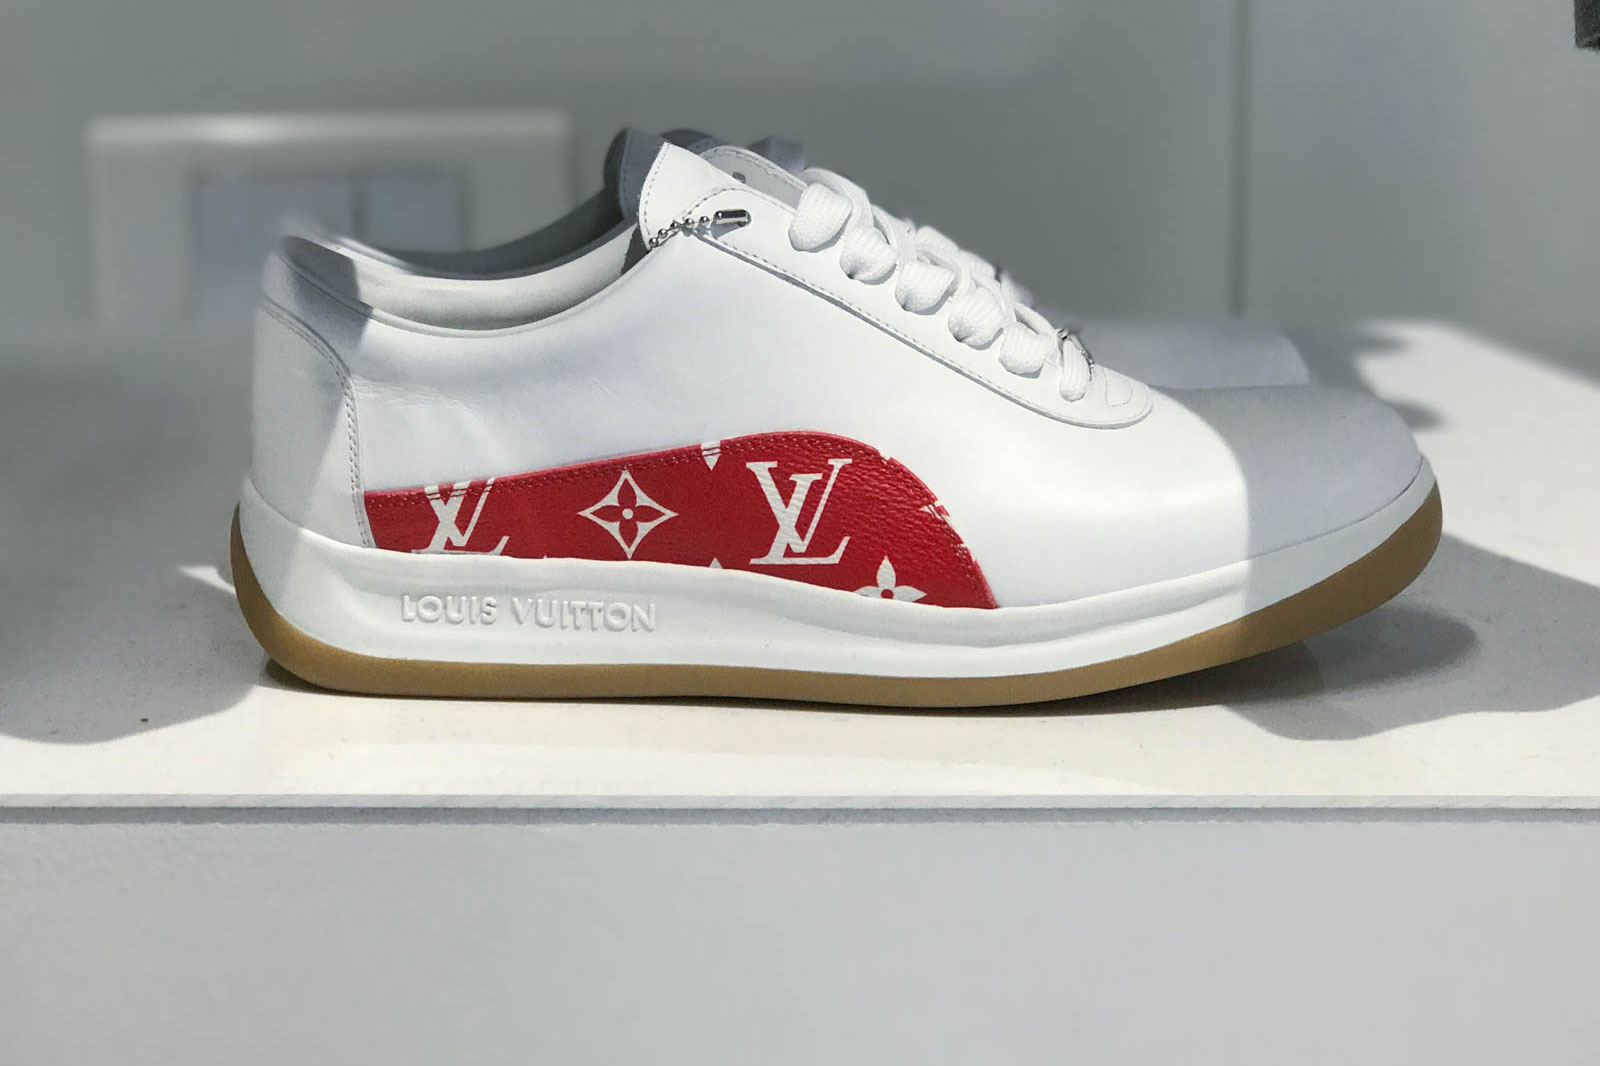 Supreme x Louis Vuitton 2017 Fall/Winter Closer Look Showroom - 3703571